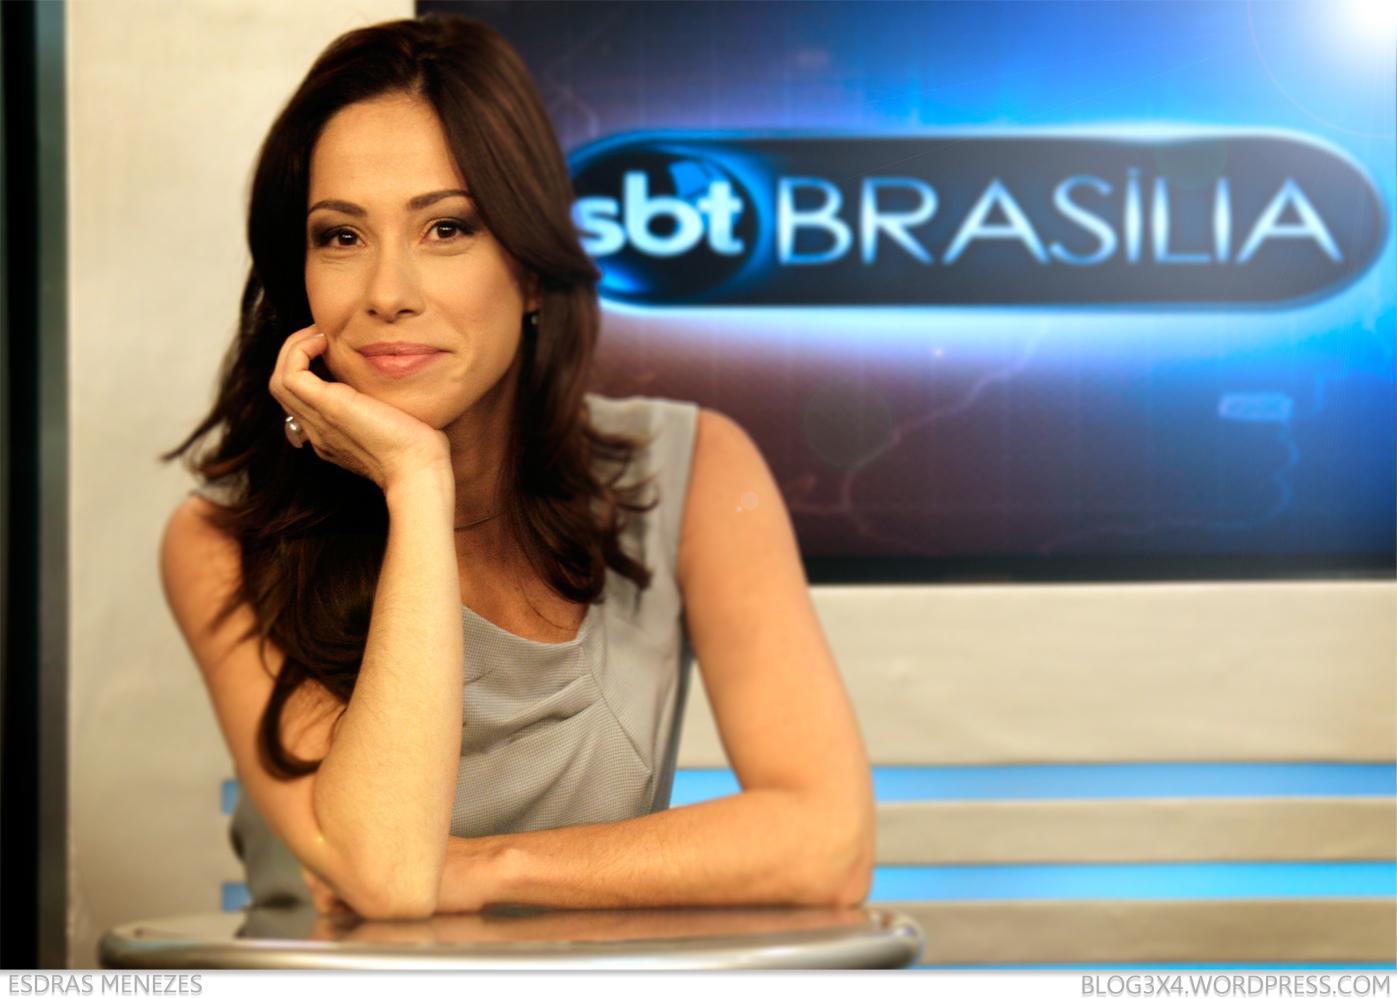 sbt-brasilia